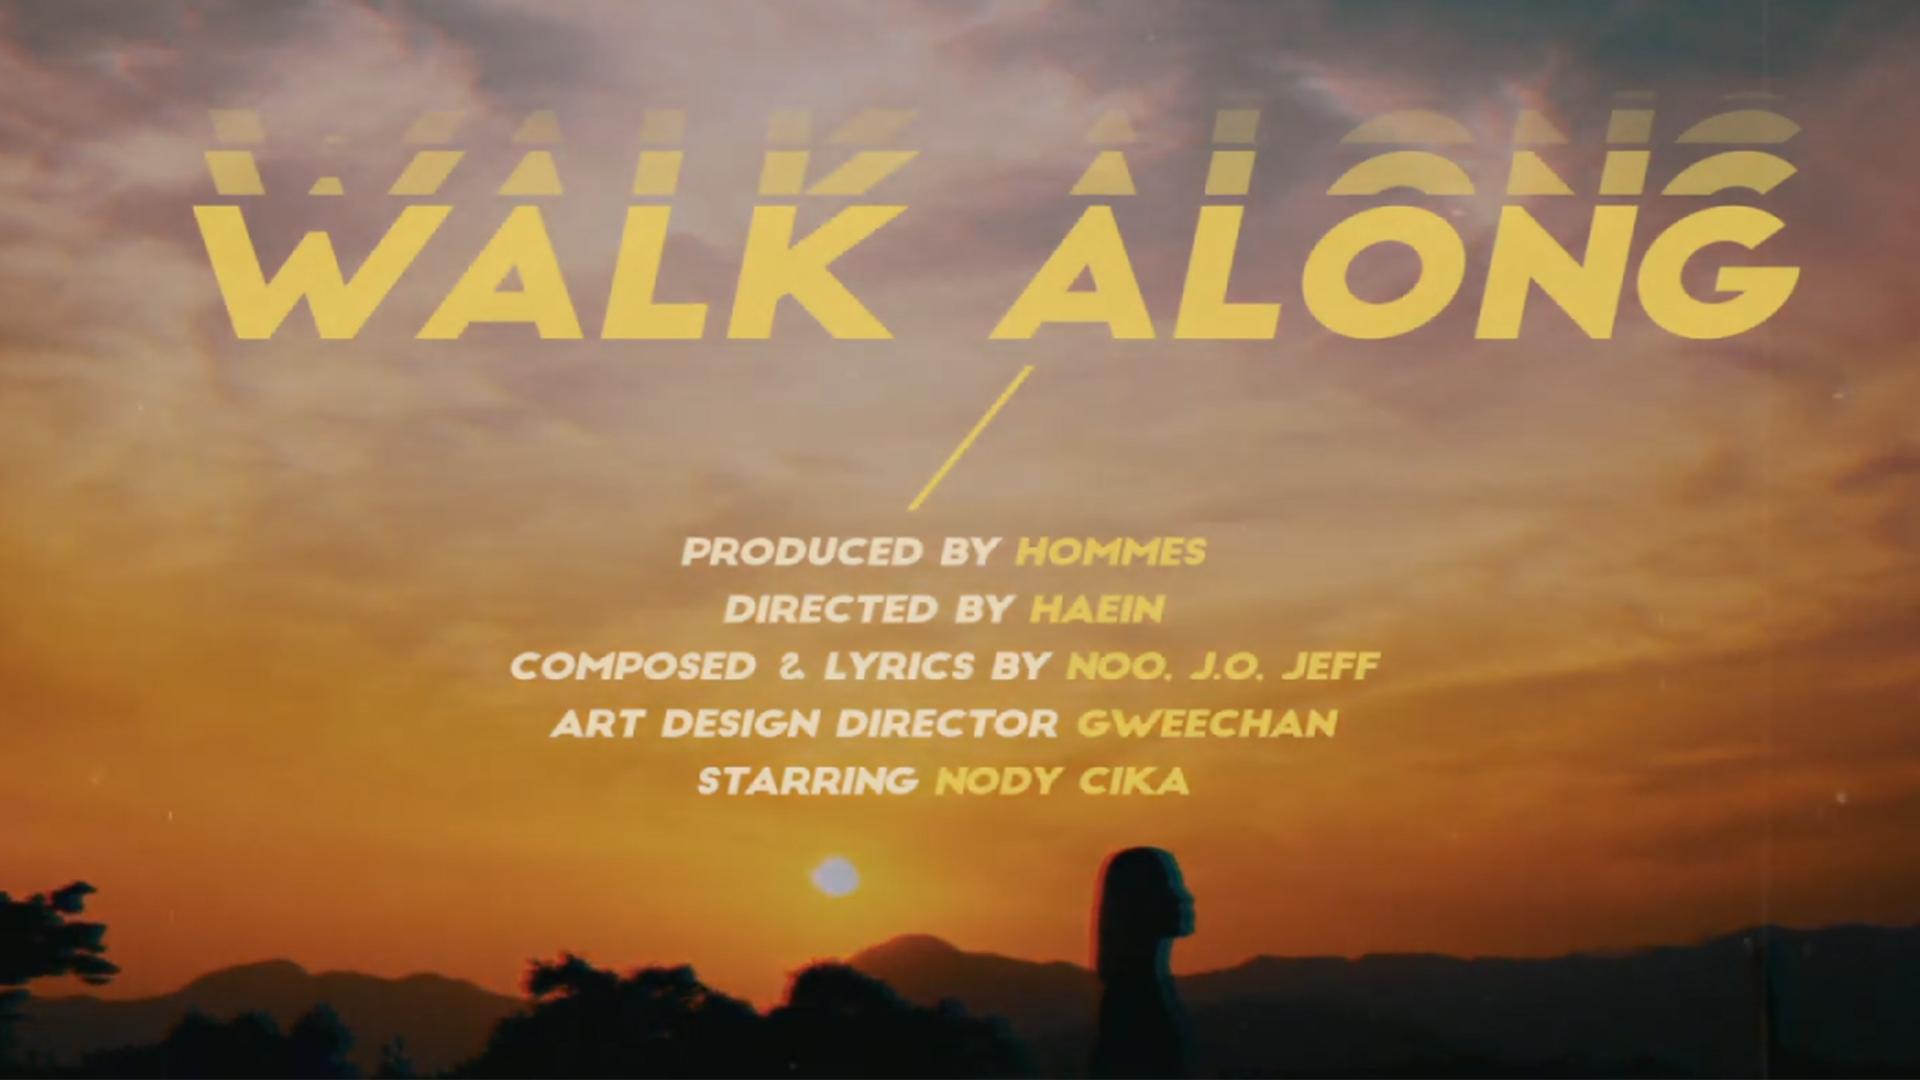 [MV] Nody Cika(노디시카) - Walk along